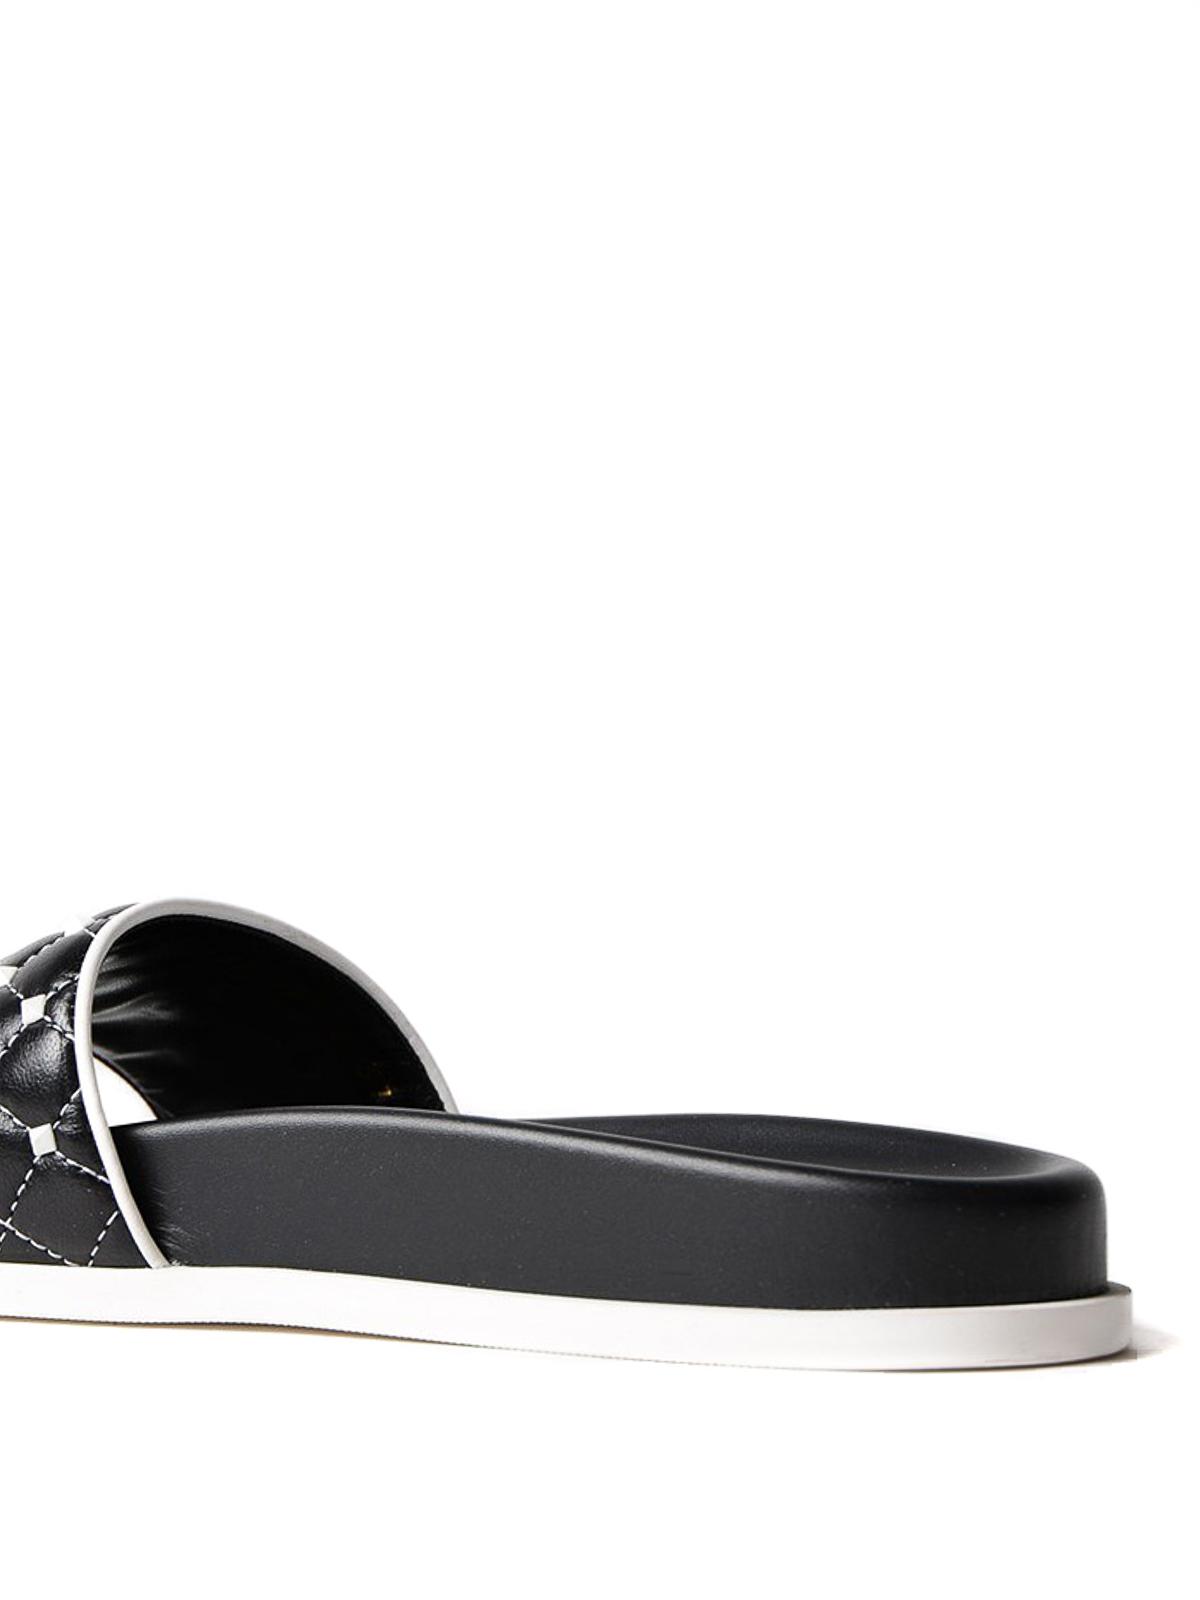 d077a1913a62 Valentino Garavani - Free Rockstud Spike black slides - sandals ...